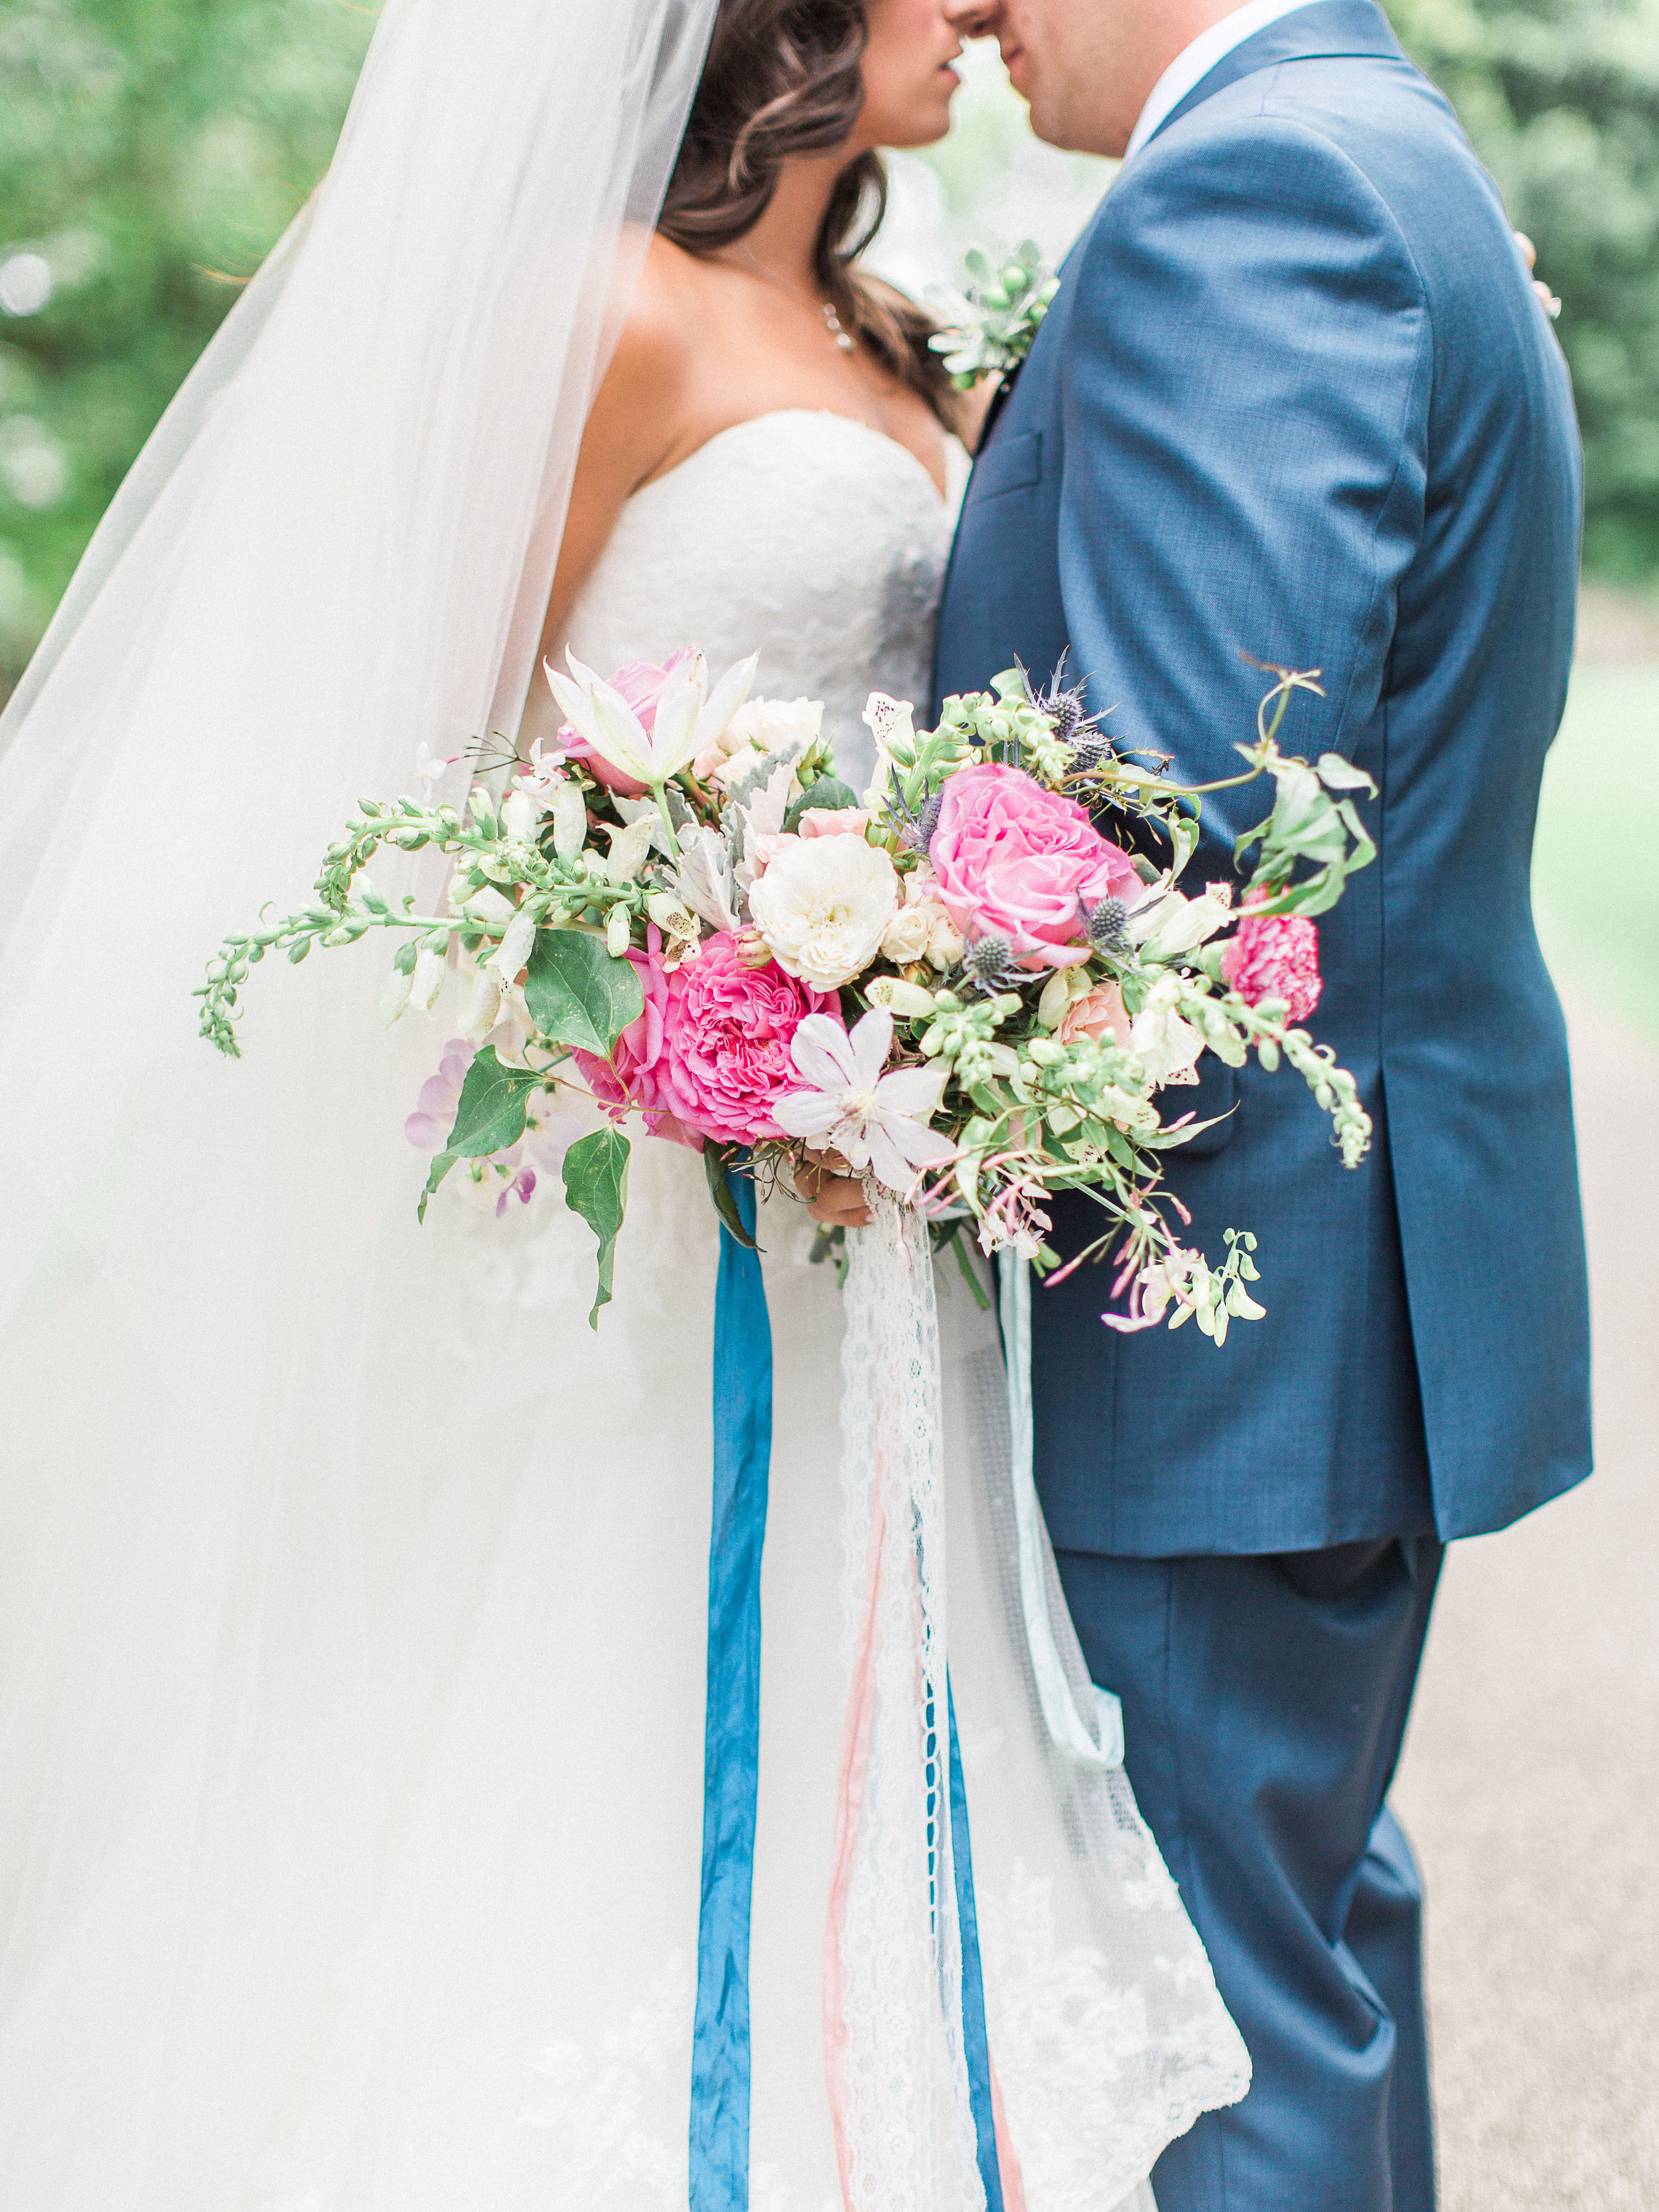 ERIC AND HALLIE WEDDING-HI RESOLUTION FOR PRINTING-0253.jpg